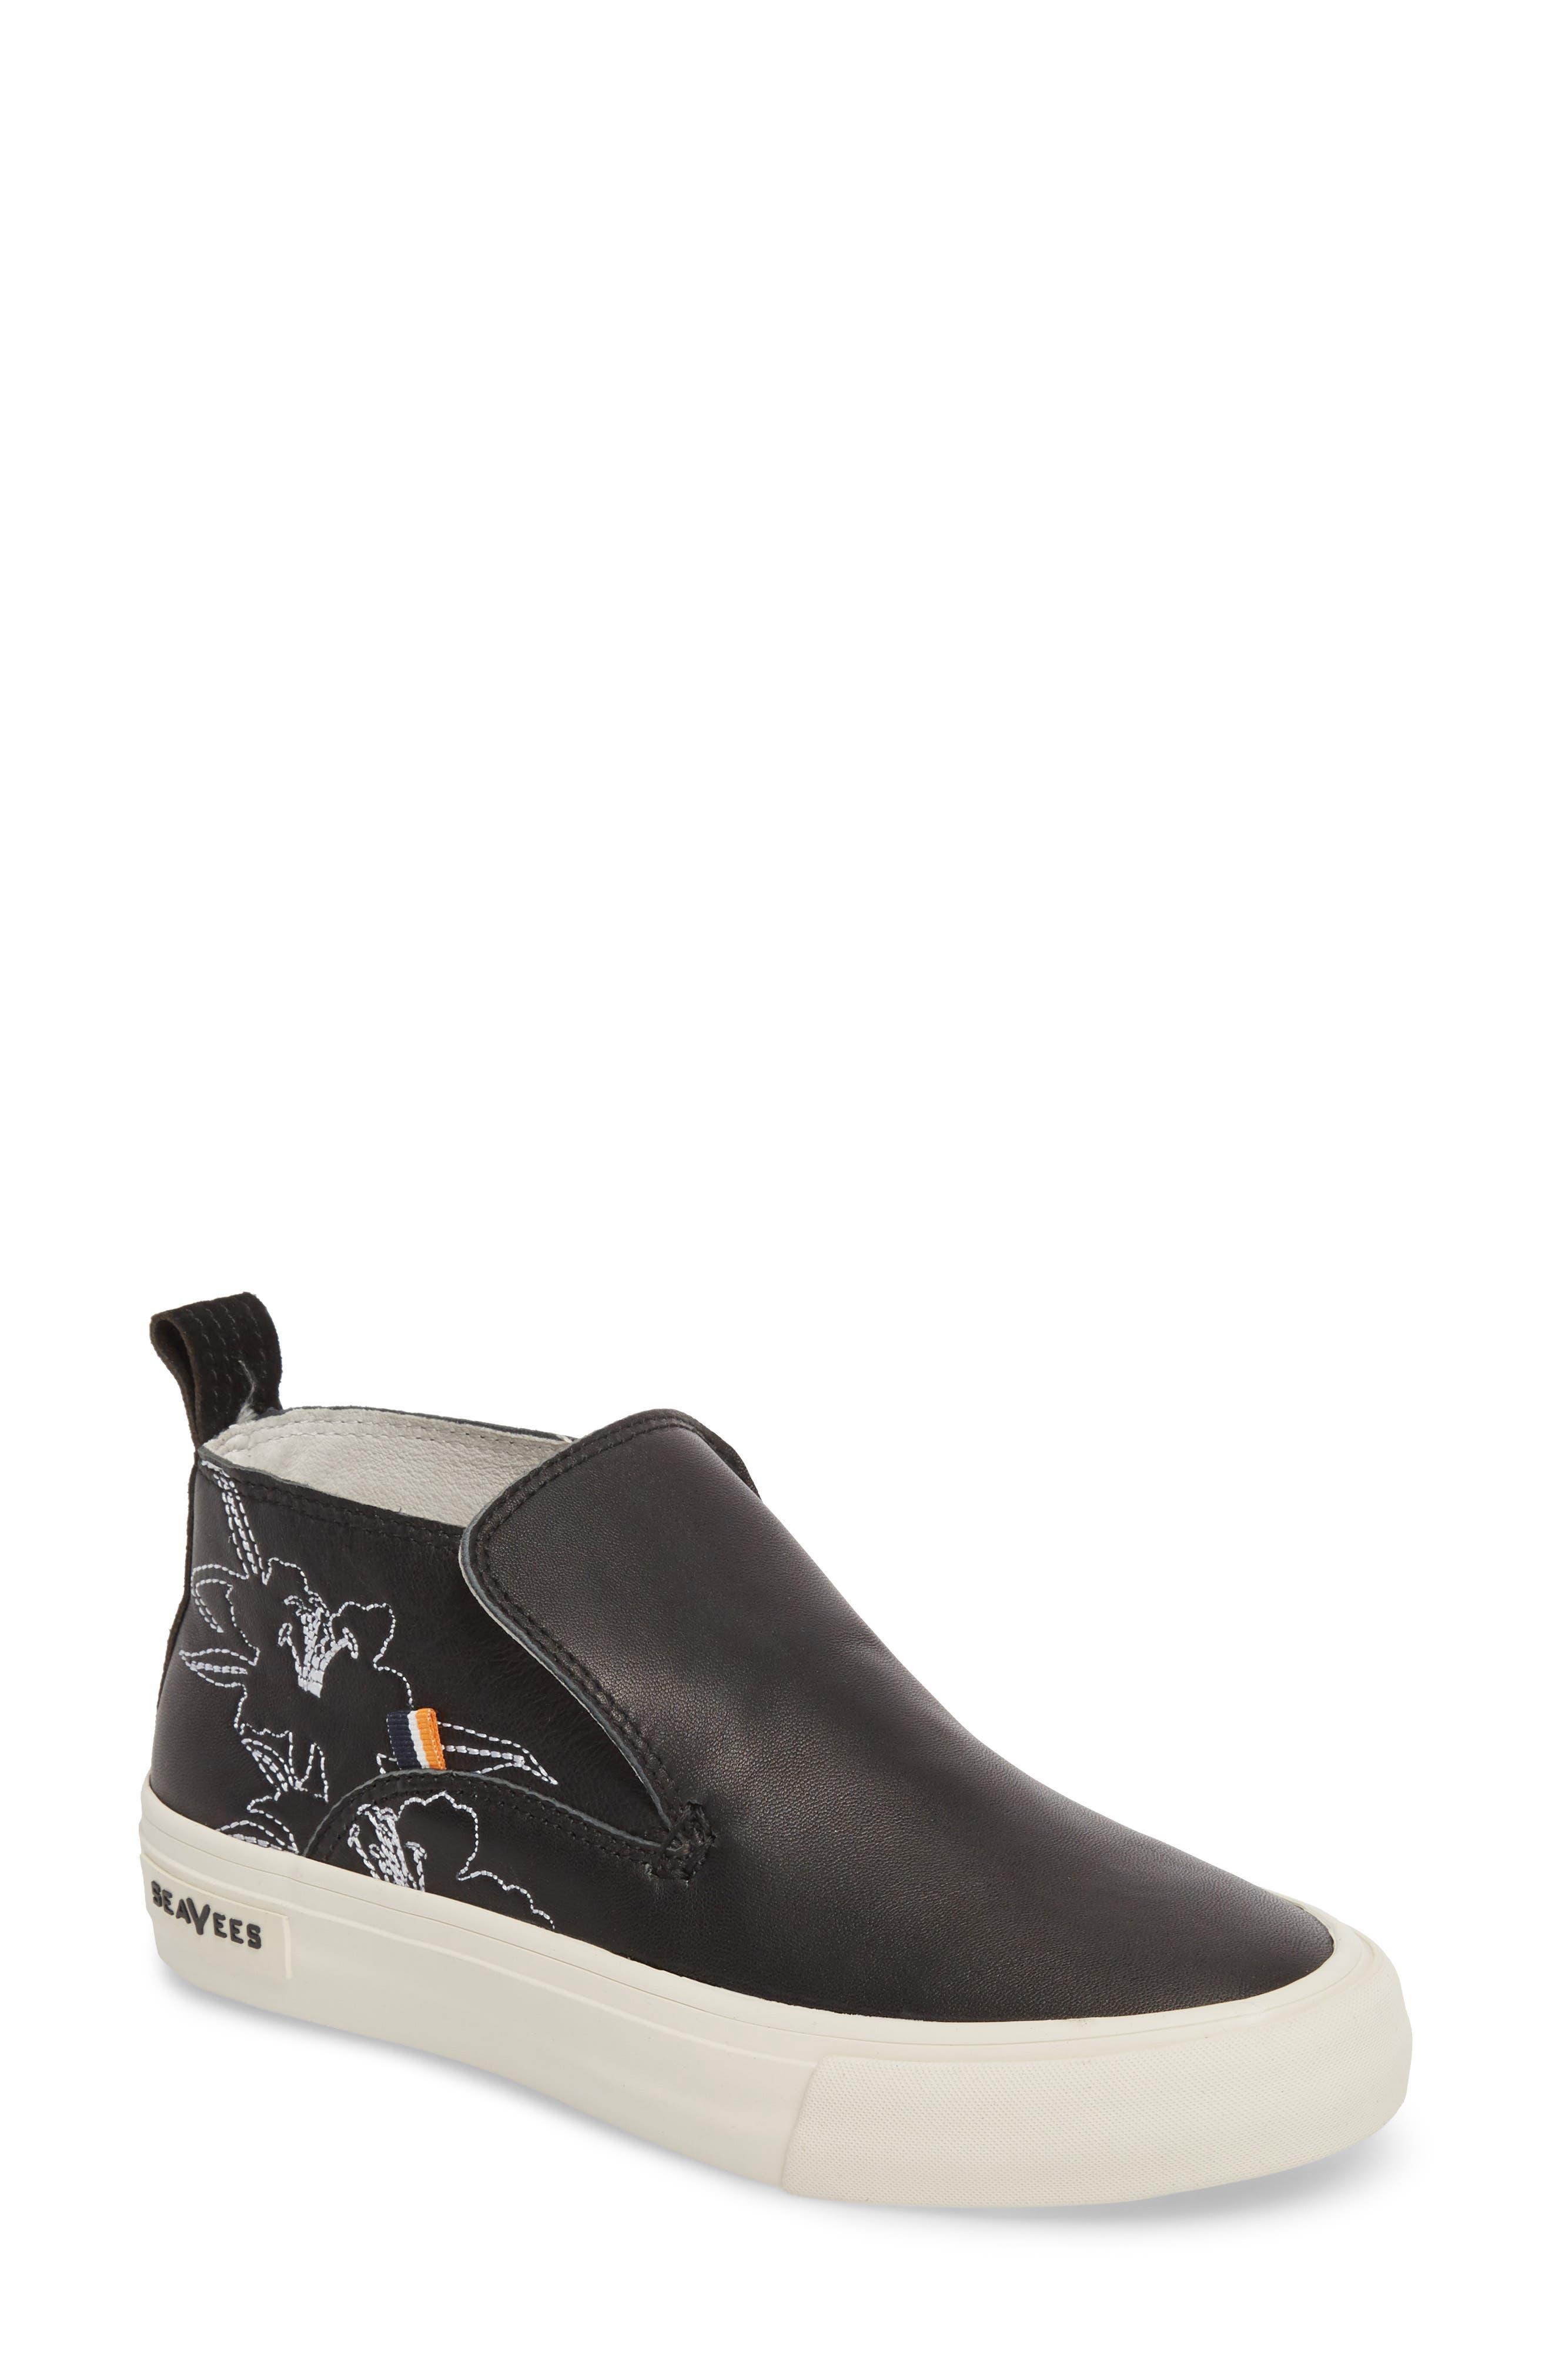 x Derek Lam 10 Crosby Huntington Middie Sneaker,                             Main thumbnail 1, color,                             BLACK LEATHER